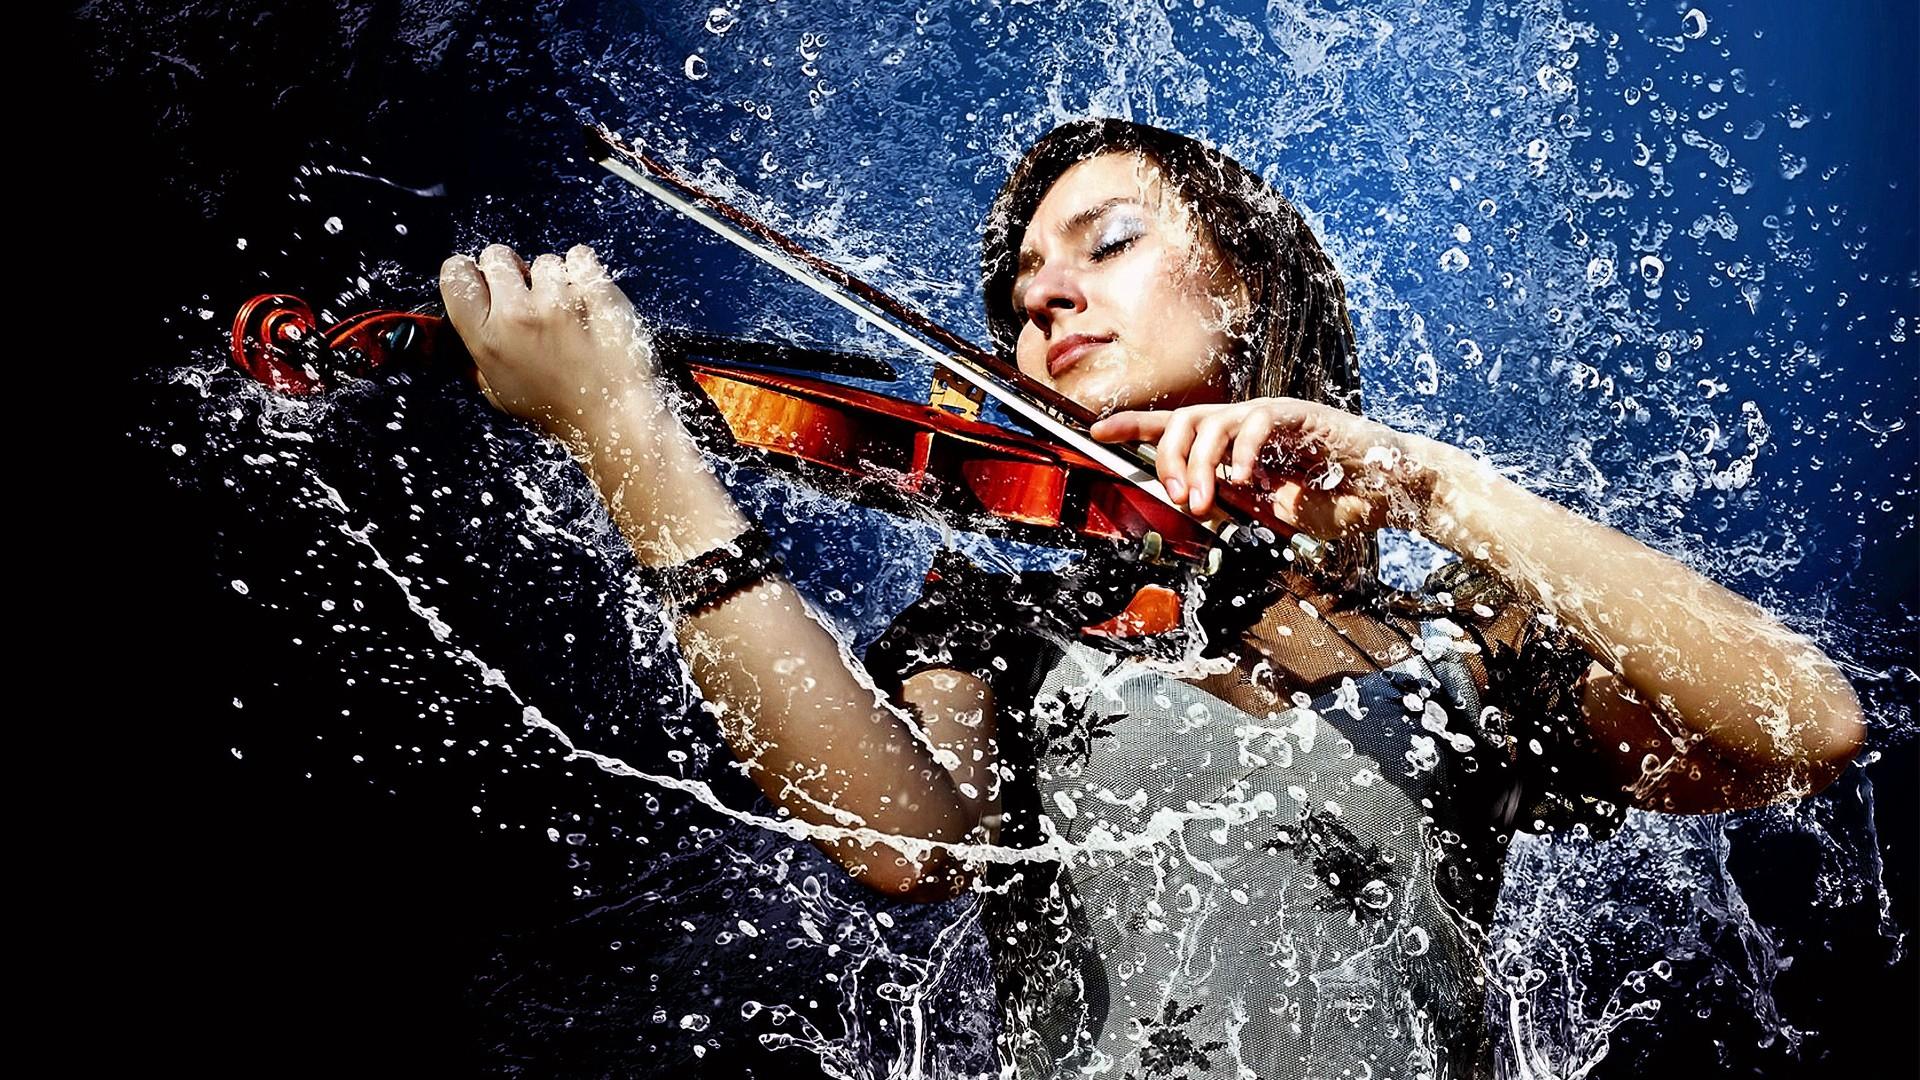 People 1920x1080 women music violin water rain liquid wet closed eyes musician musical instrument photo manipulation water drops